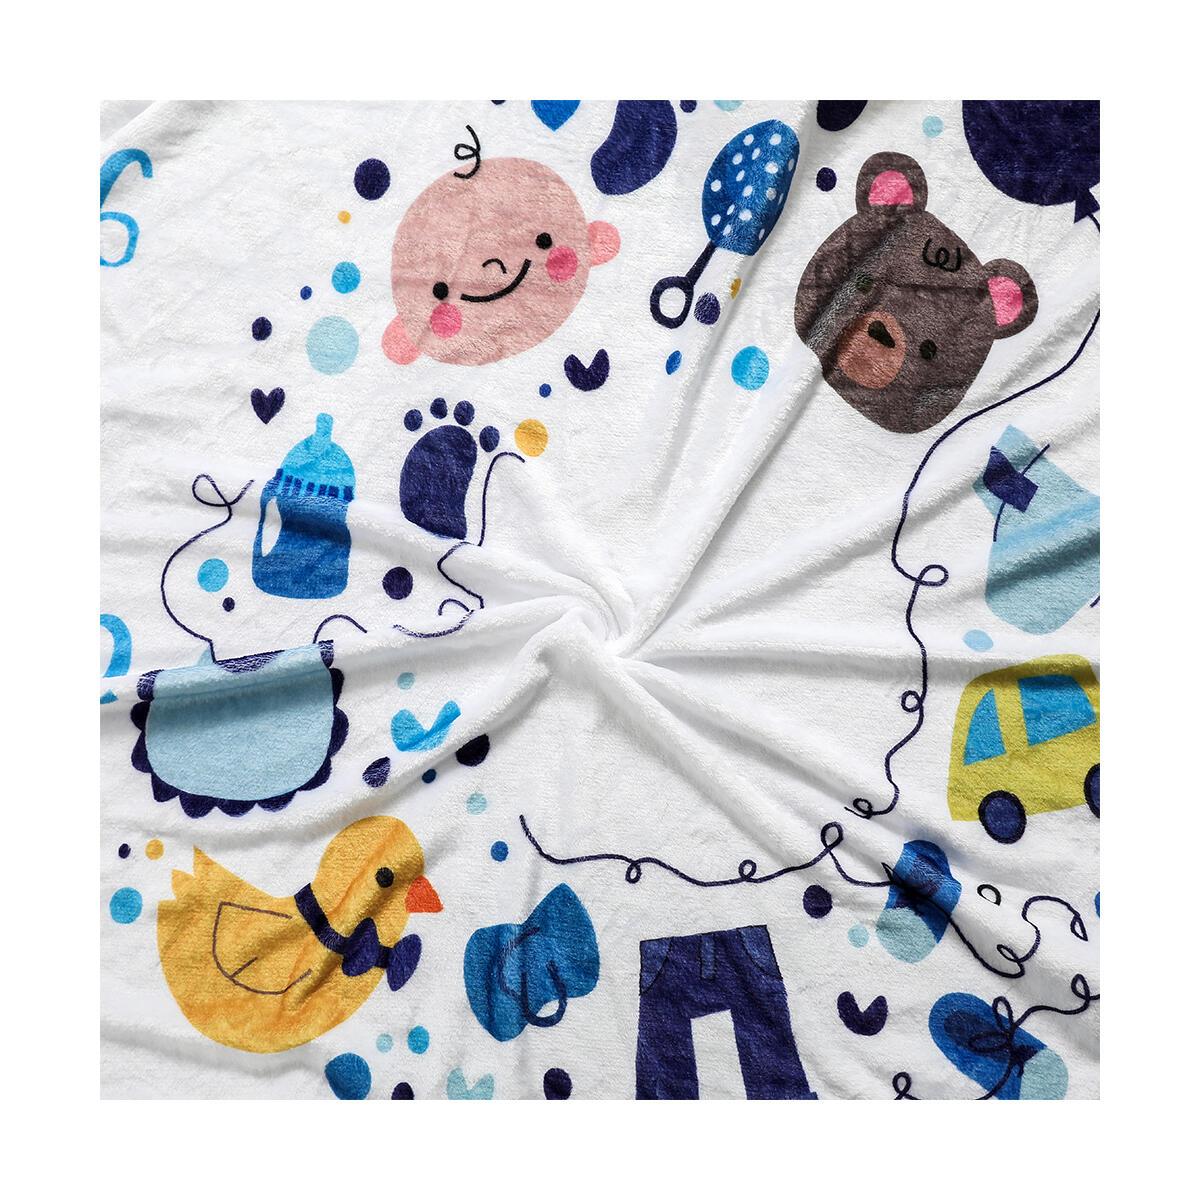 Smart Export LLC Baby Monthly Milestone Blanket, Month Blanket,Photo Blanket for Newborn Baby Shower, Baby Milestone Blanket, Newborn Shower Gifts, Best Photography Backdrop 60